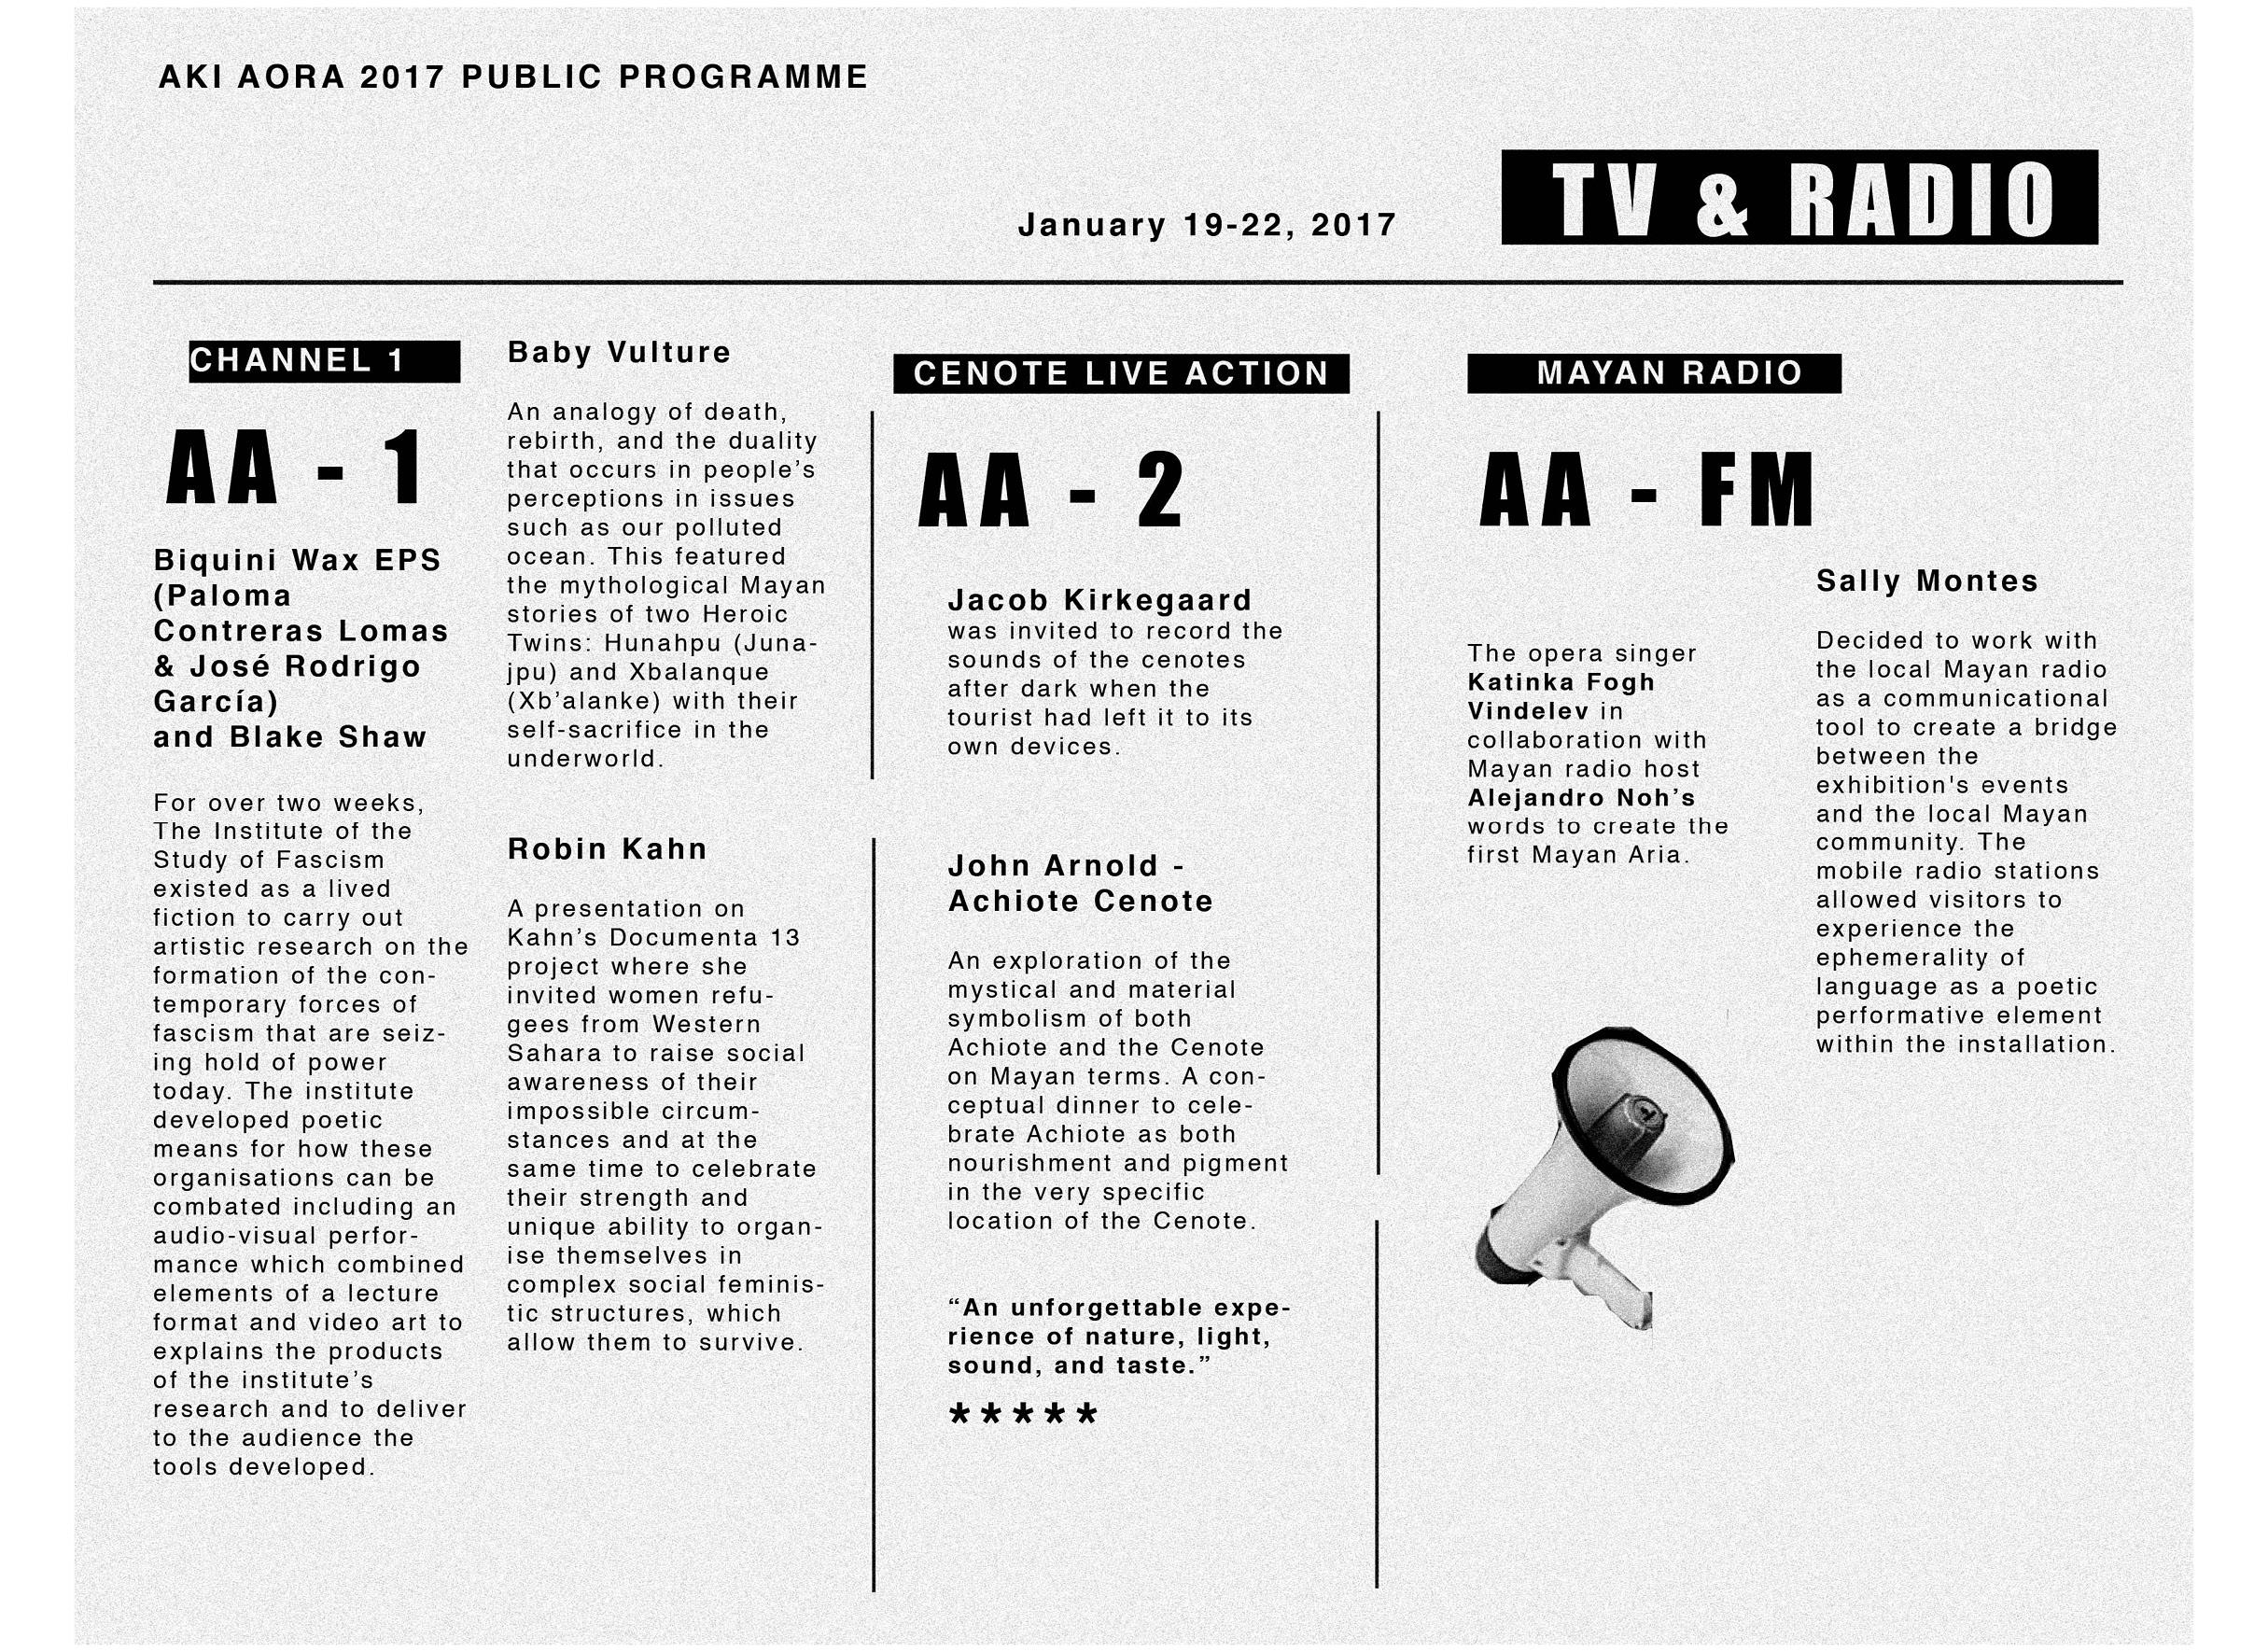 Update Ingles February 26 Public Programme4.jpg